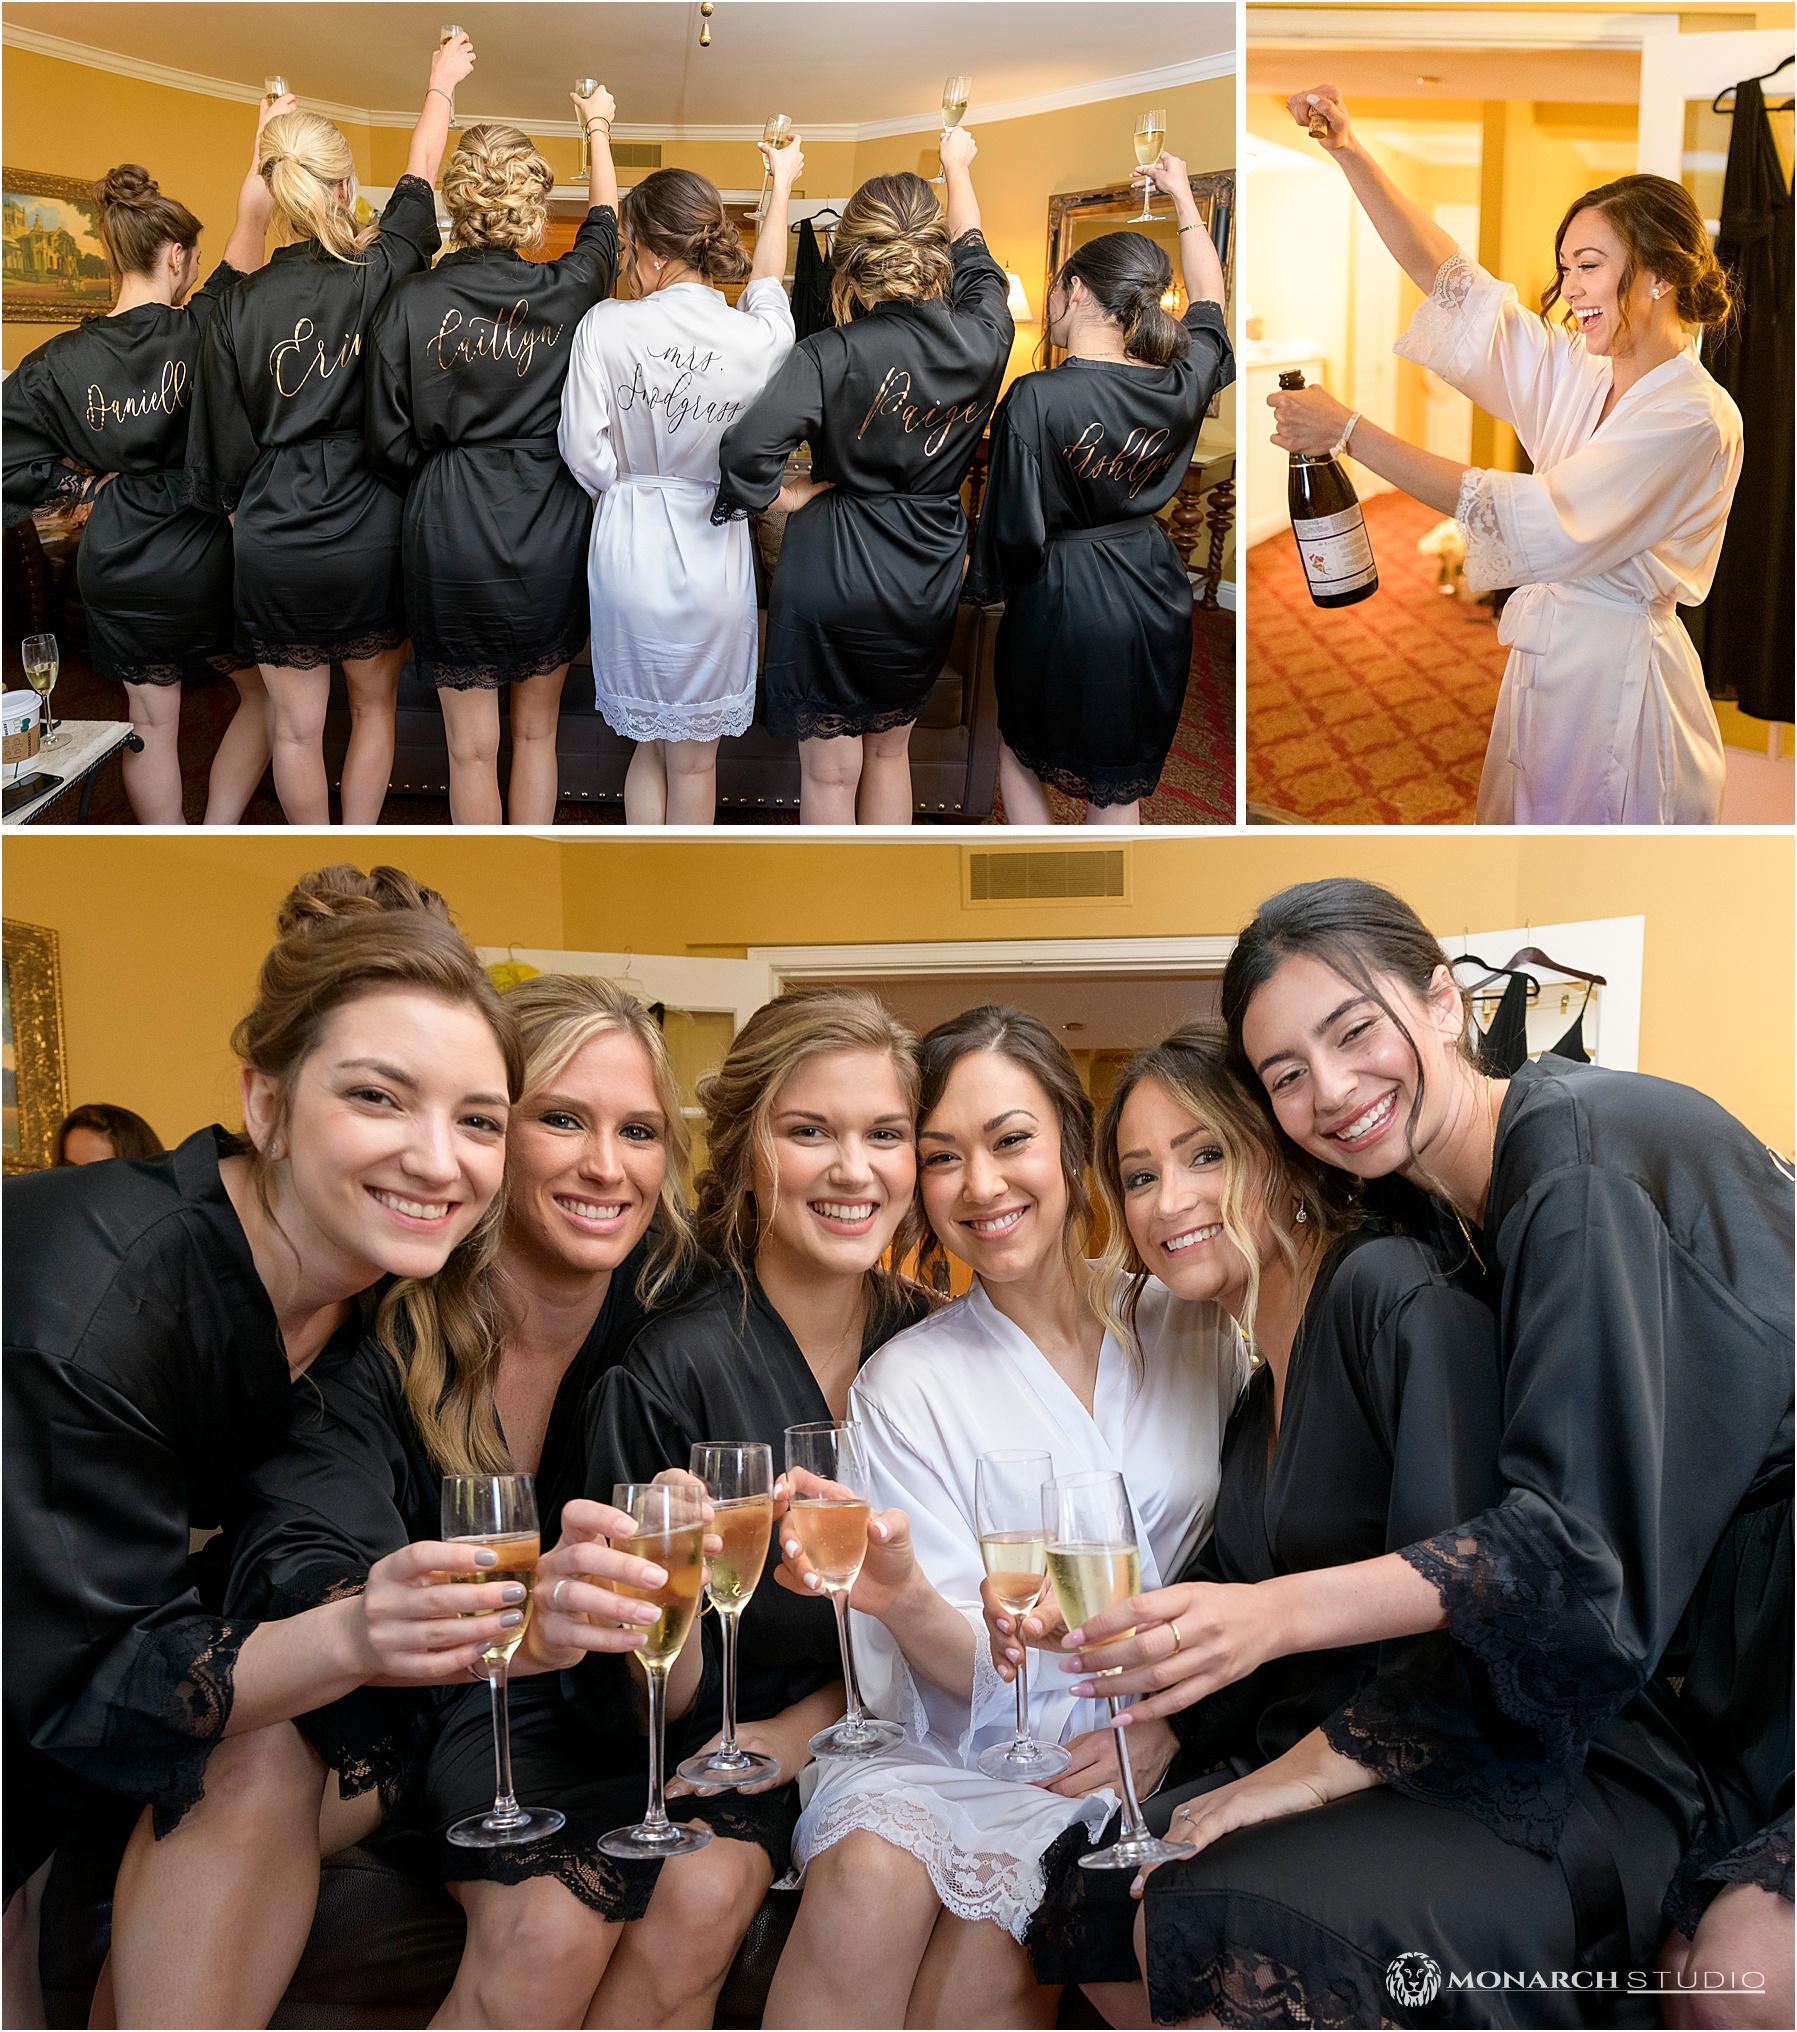 st-augustine-high-end-wedding-photographers-004.jpg